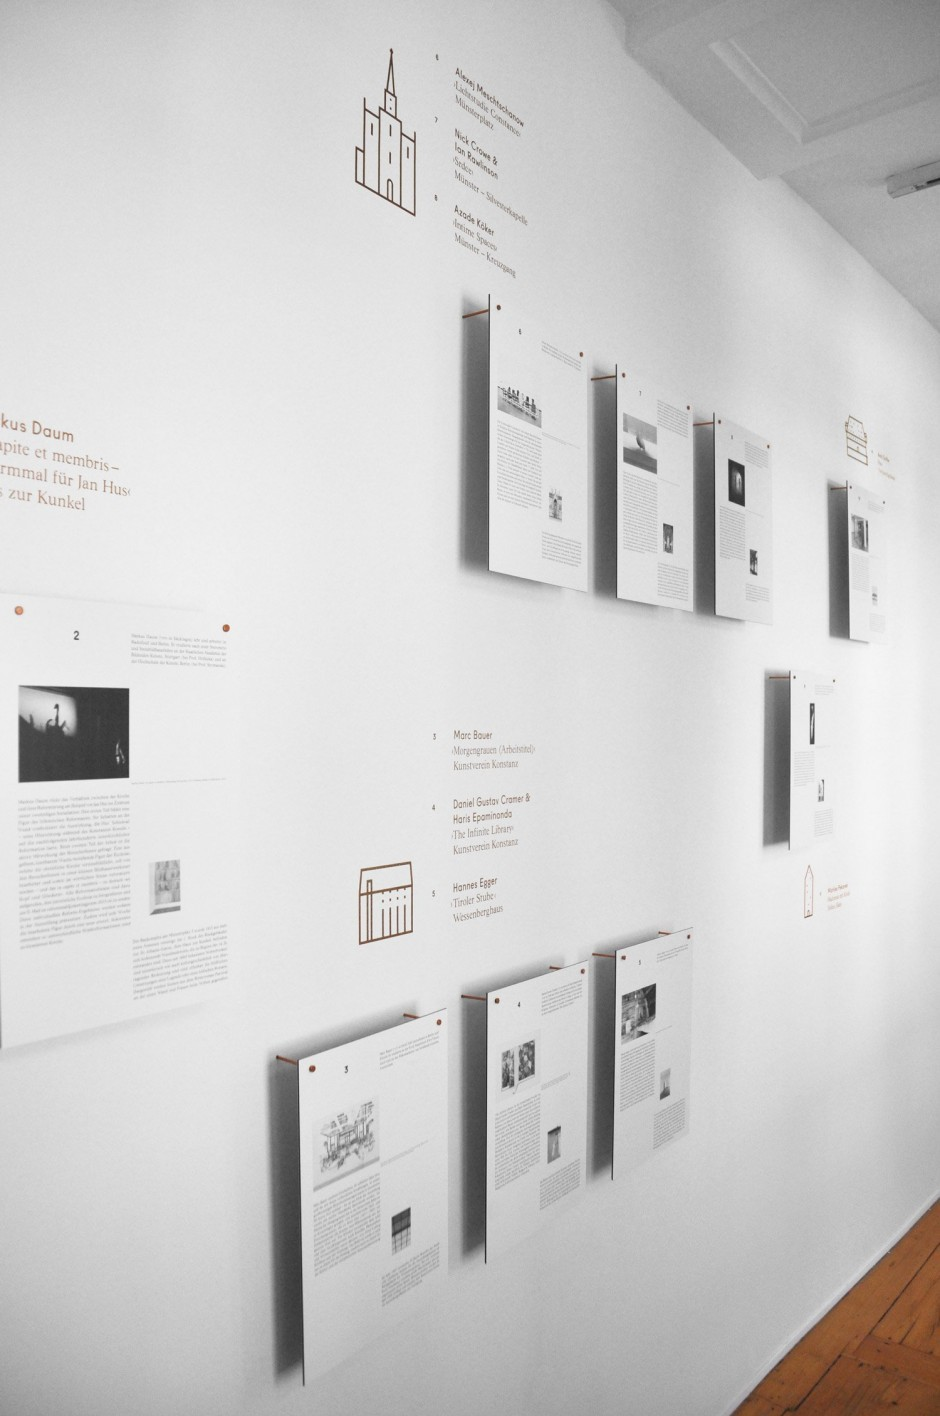 meeting-point-exhibition-installation3-001